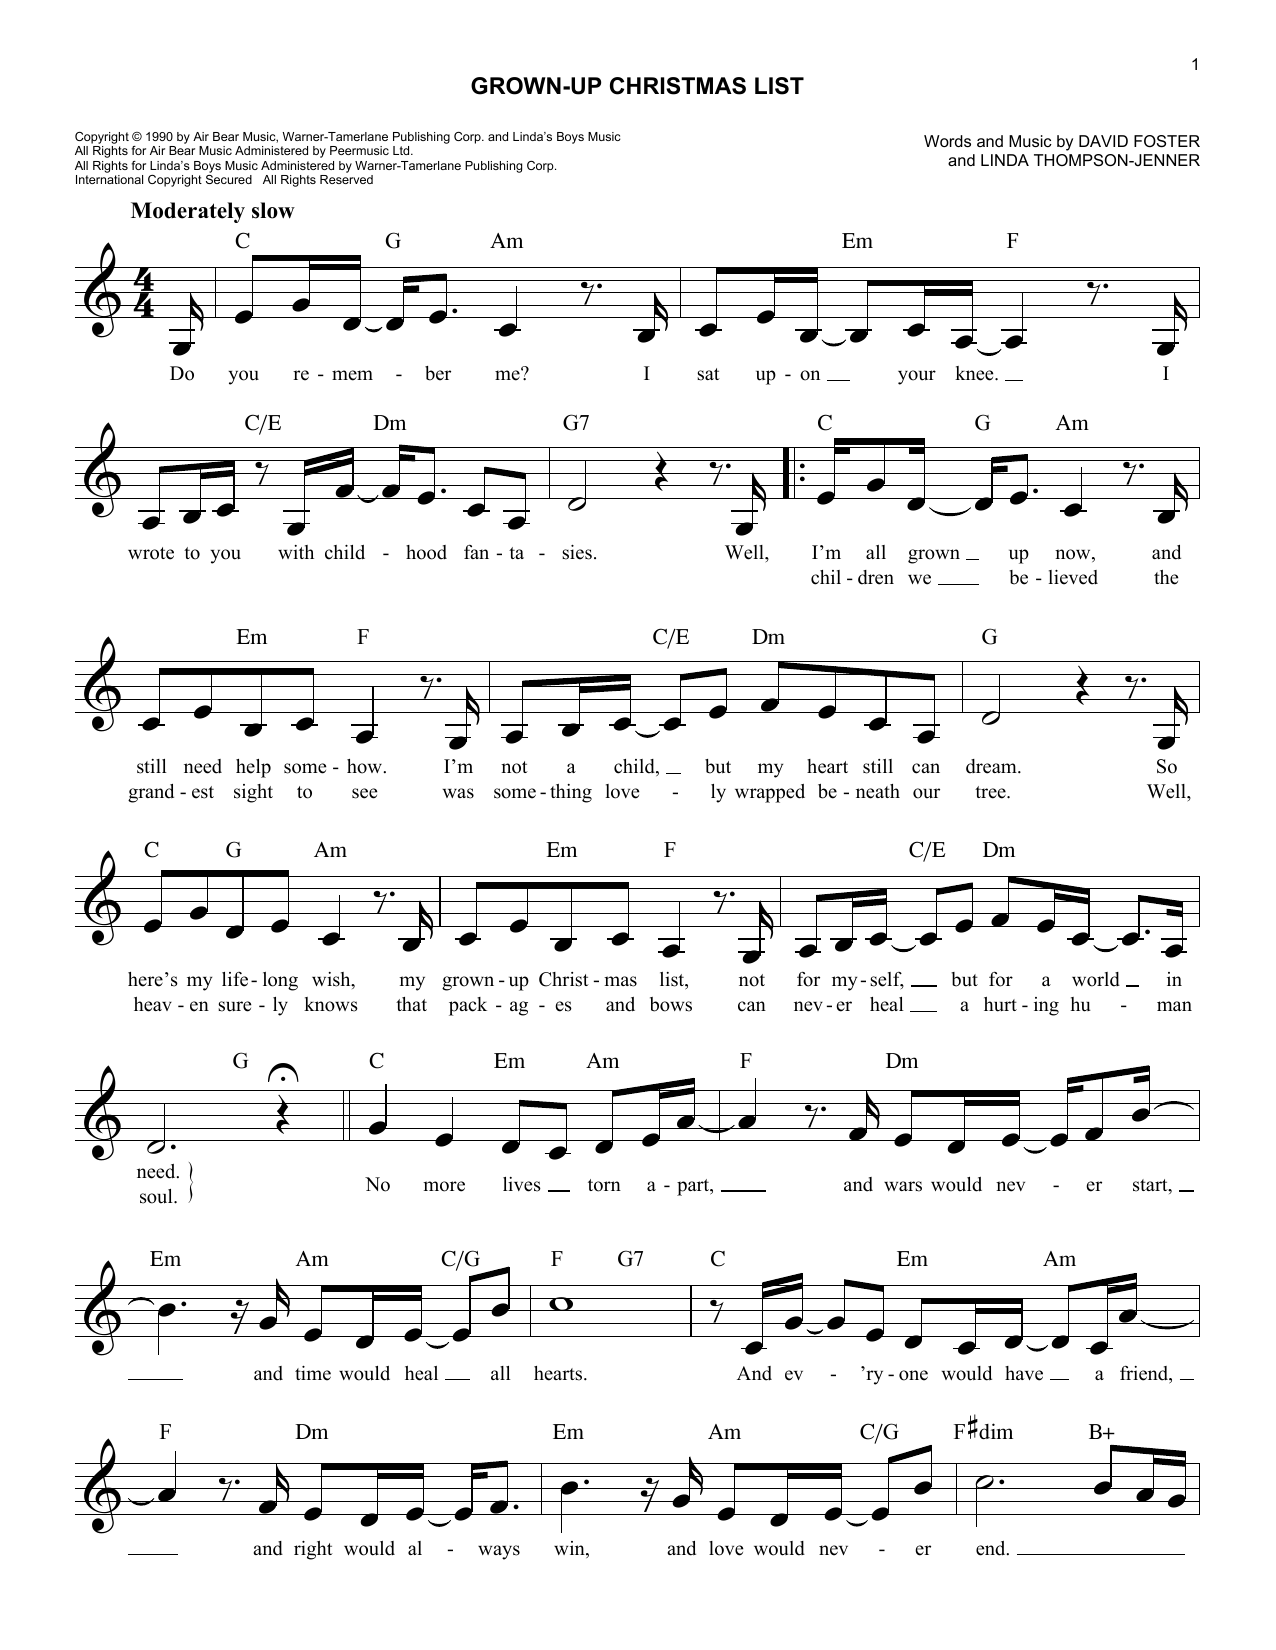 My Grownup Christmas List Lyrics.Amy Grant Grown Up Christmas List Sheet Music Notes